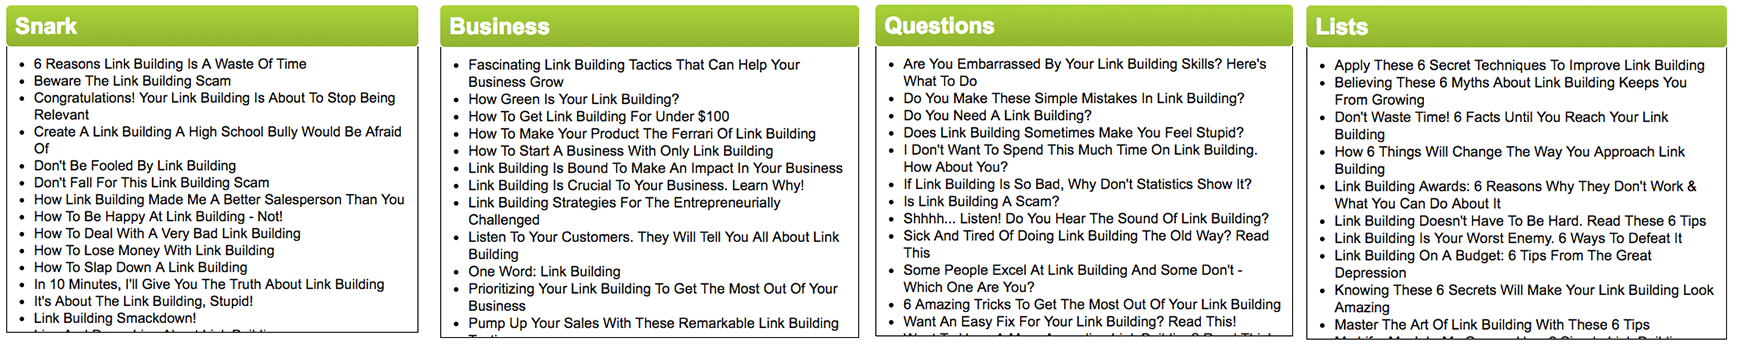 how to increase web traffic marketing agencies